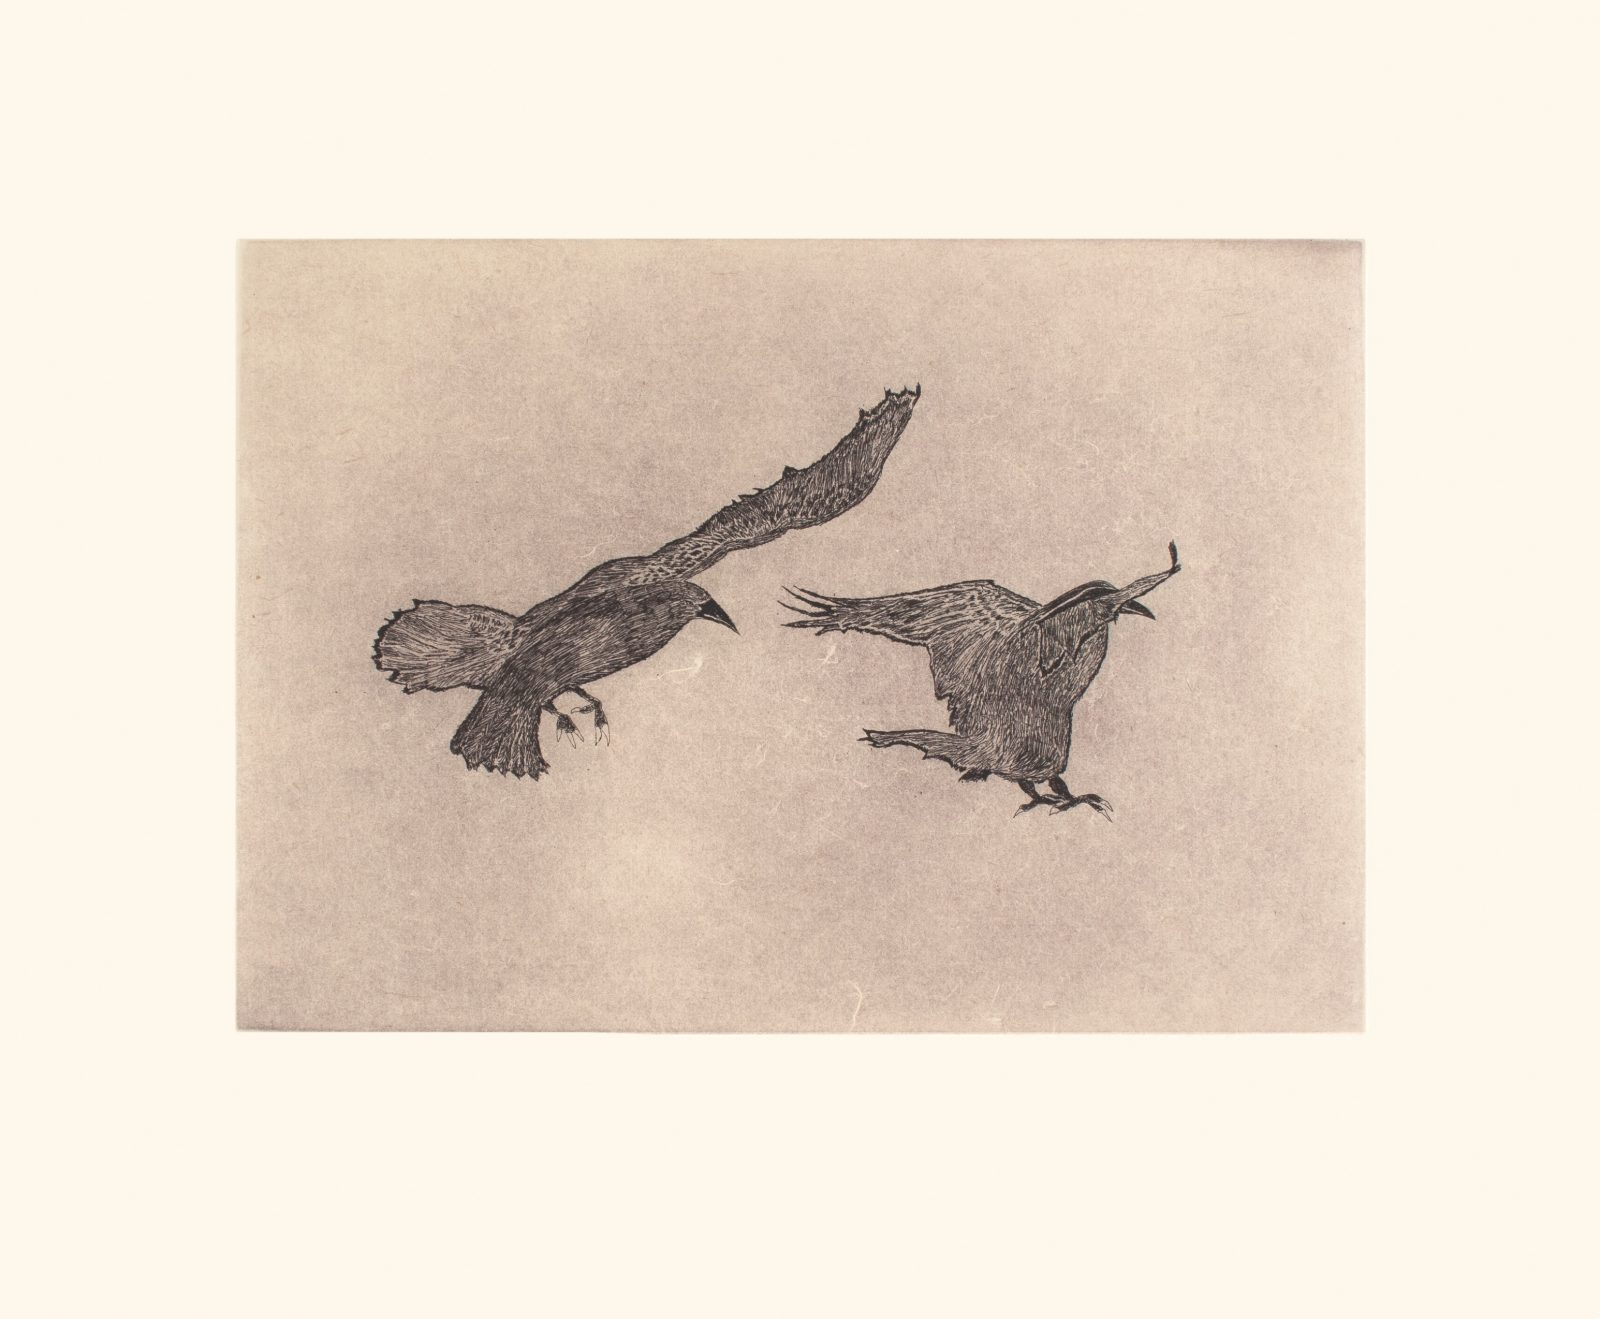 OLOOREAK ETUNGAT Misty Ravens Cape Dorset Print 2021